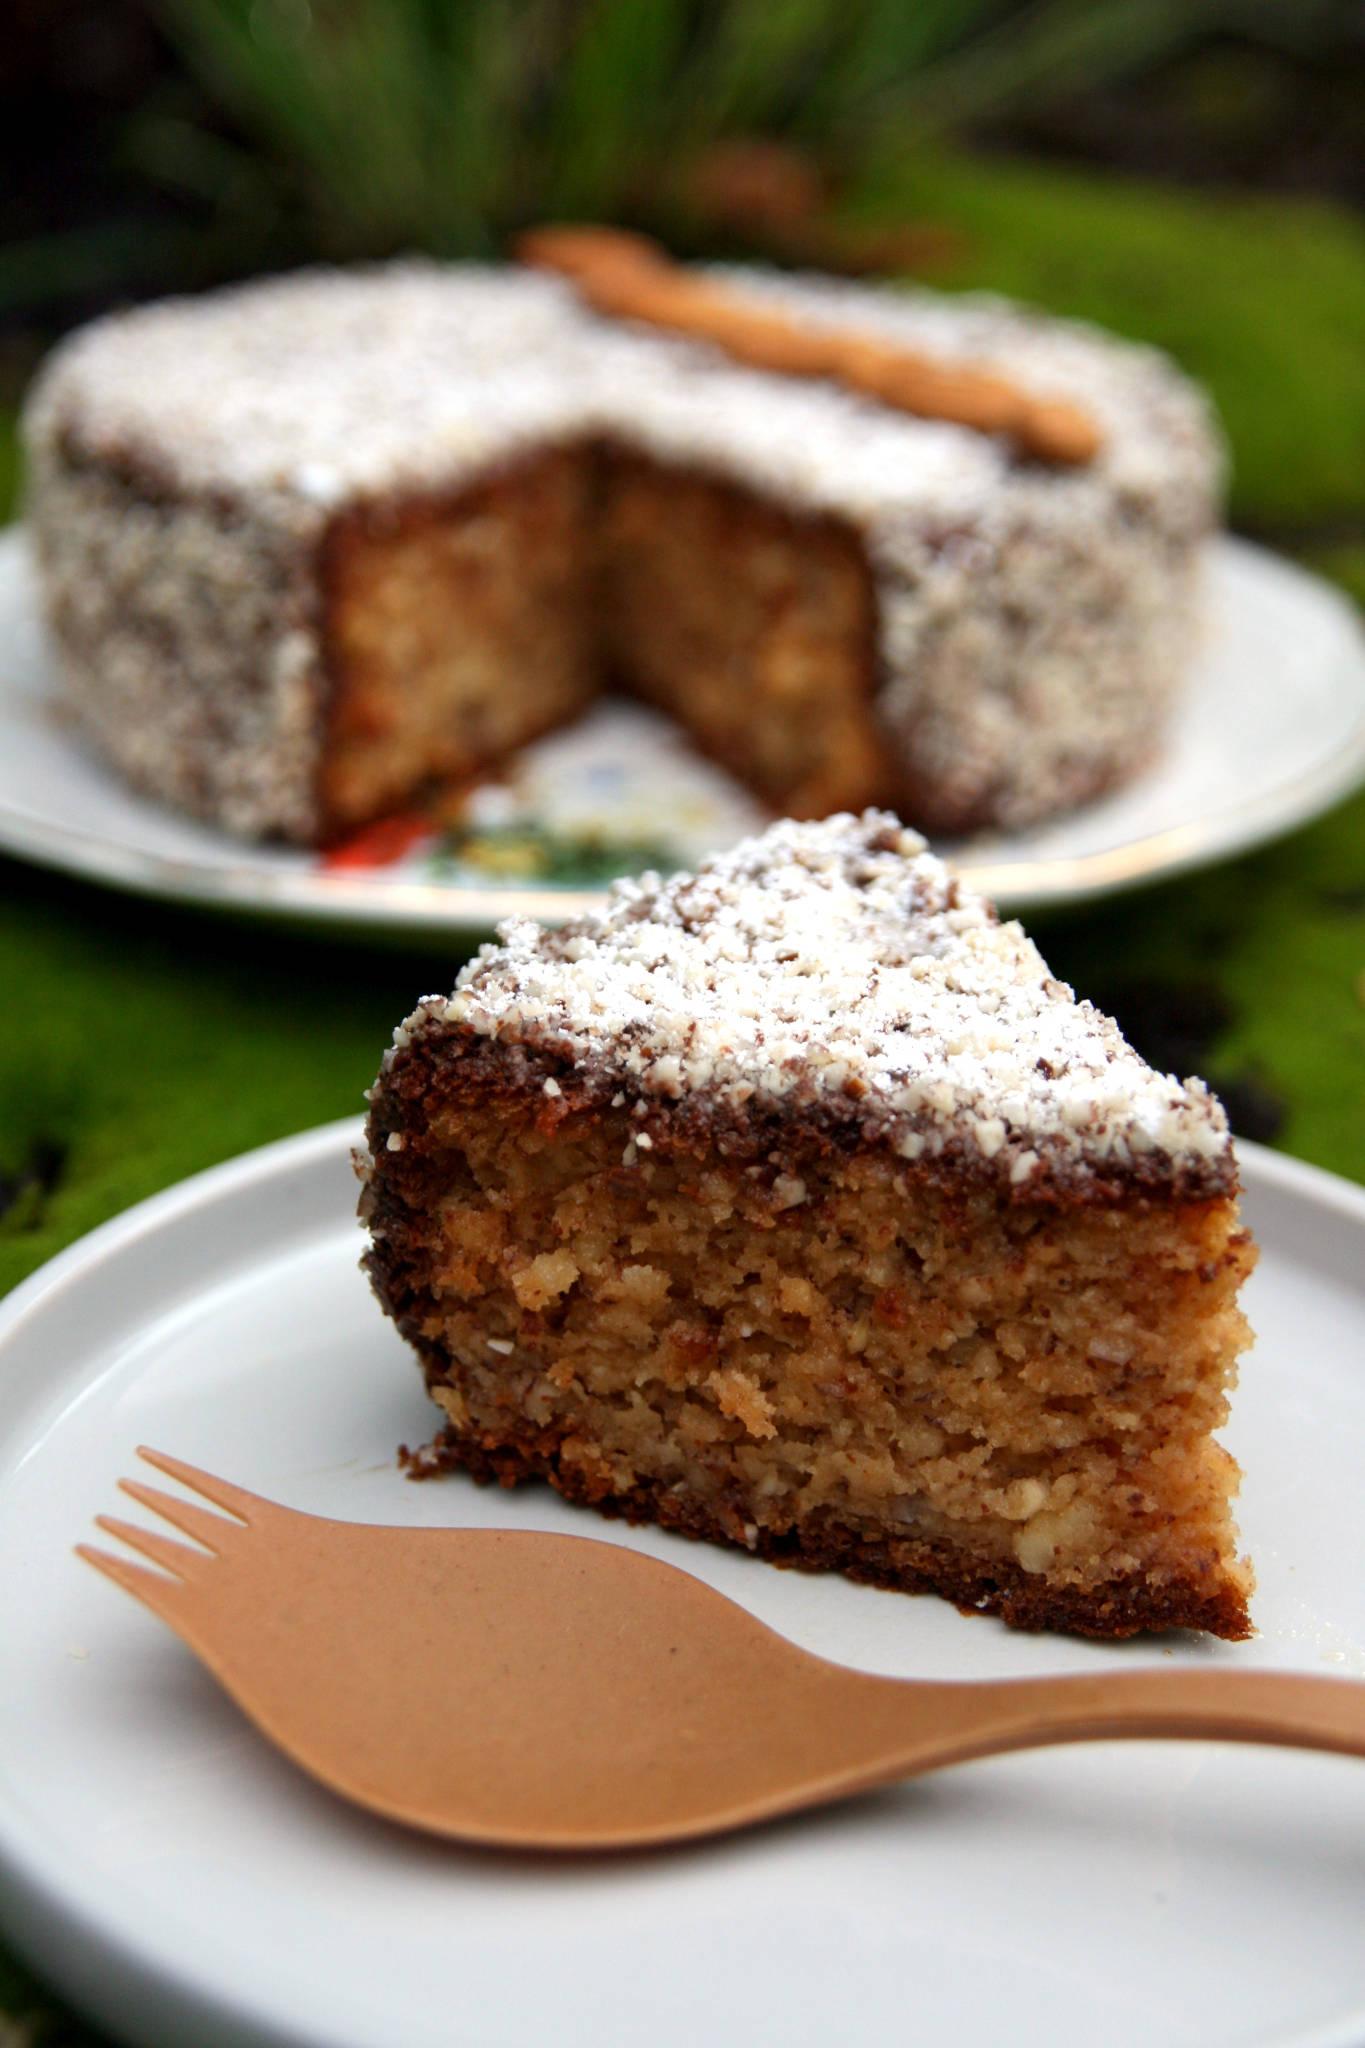 Gâteau au yaourt gourmand aux amandes